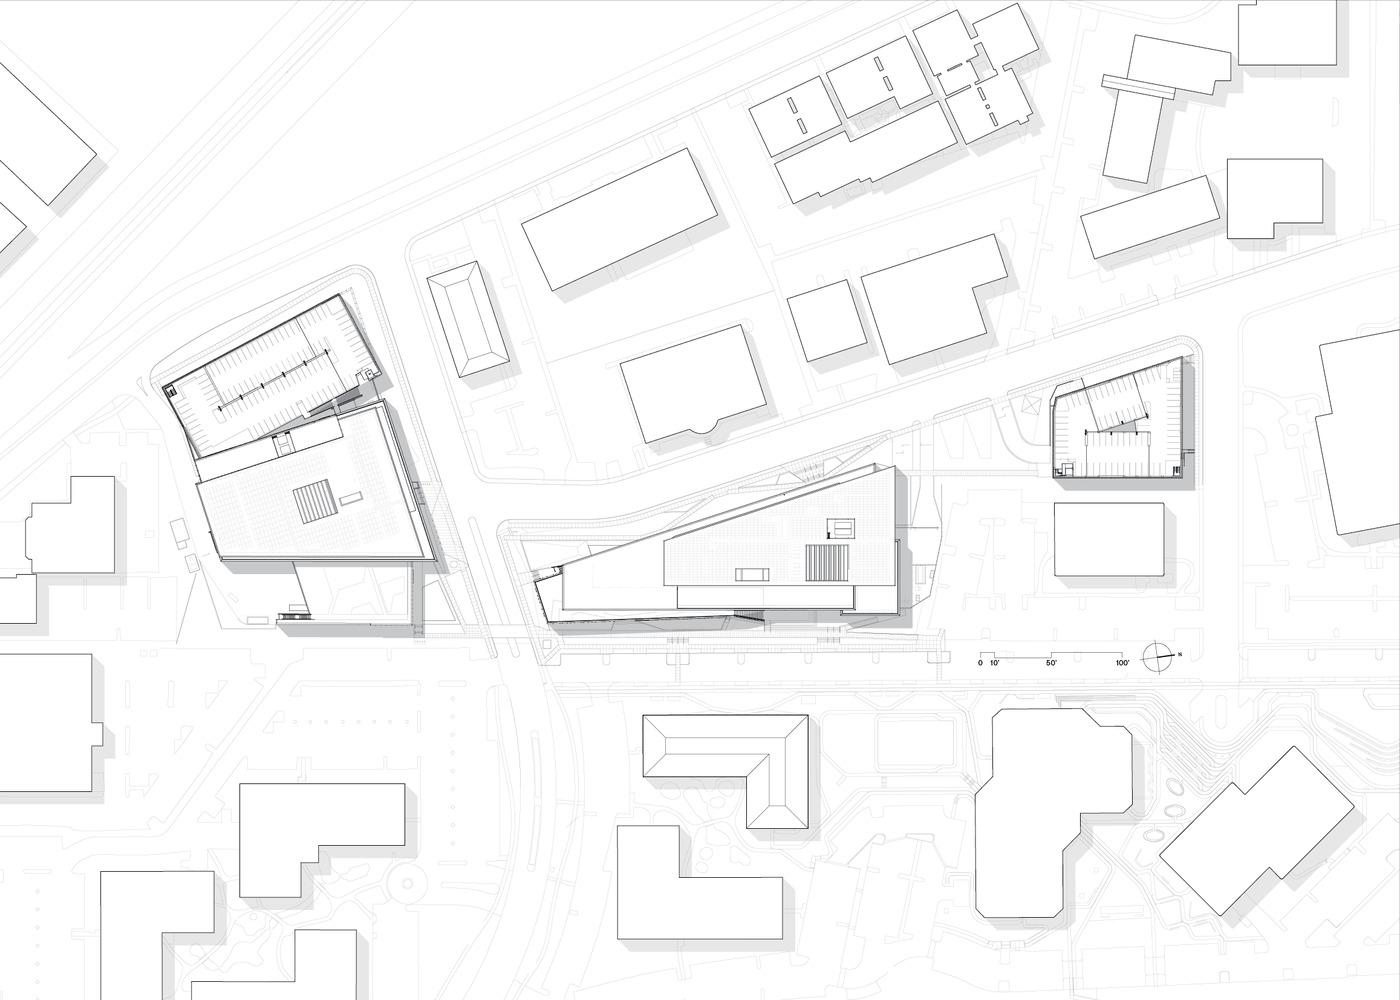 Intuit海洋路大廈——探索可持續的公共參與型發展模式插图17